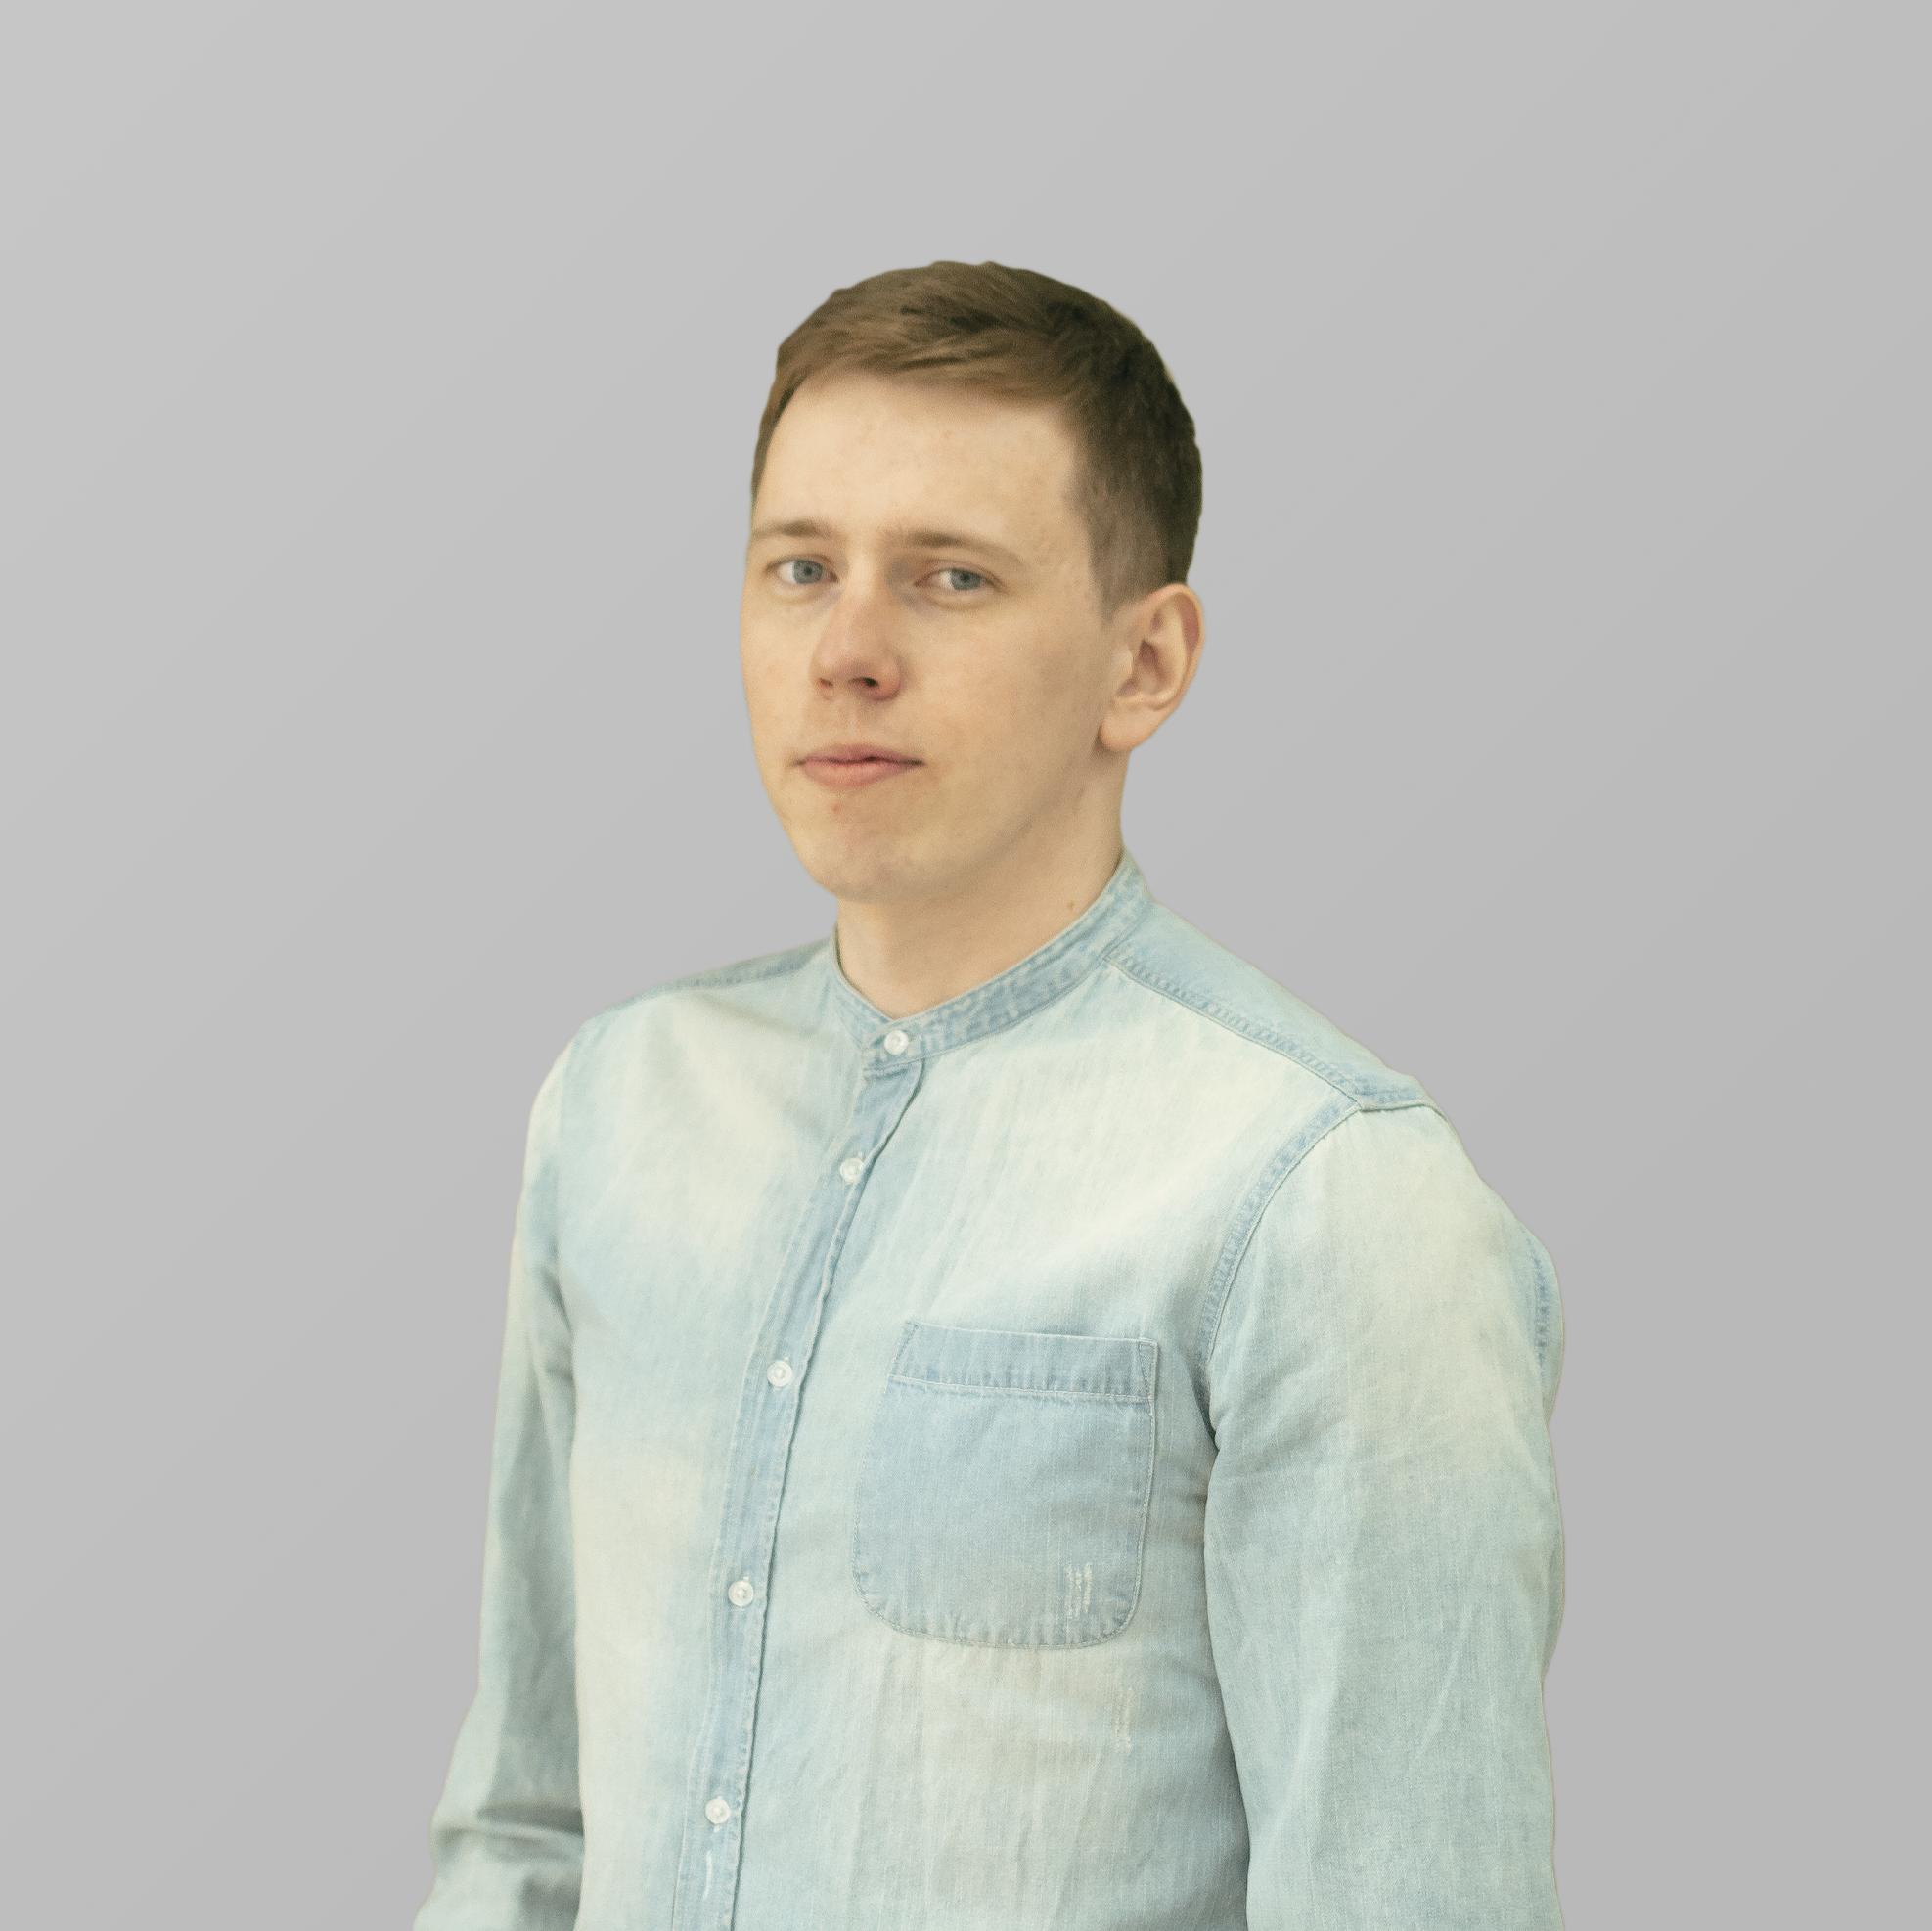 Дорофеев Василий Владимирович